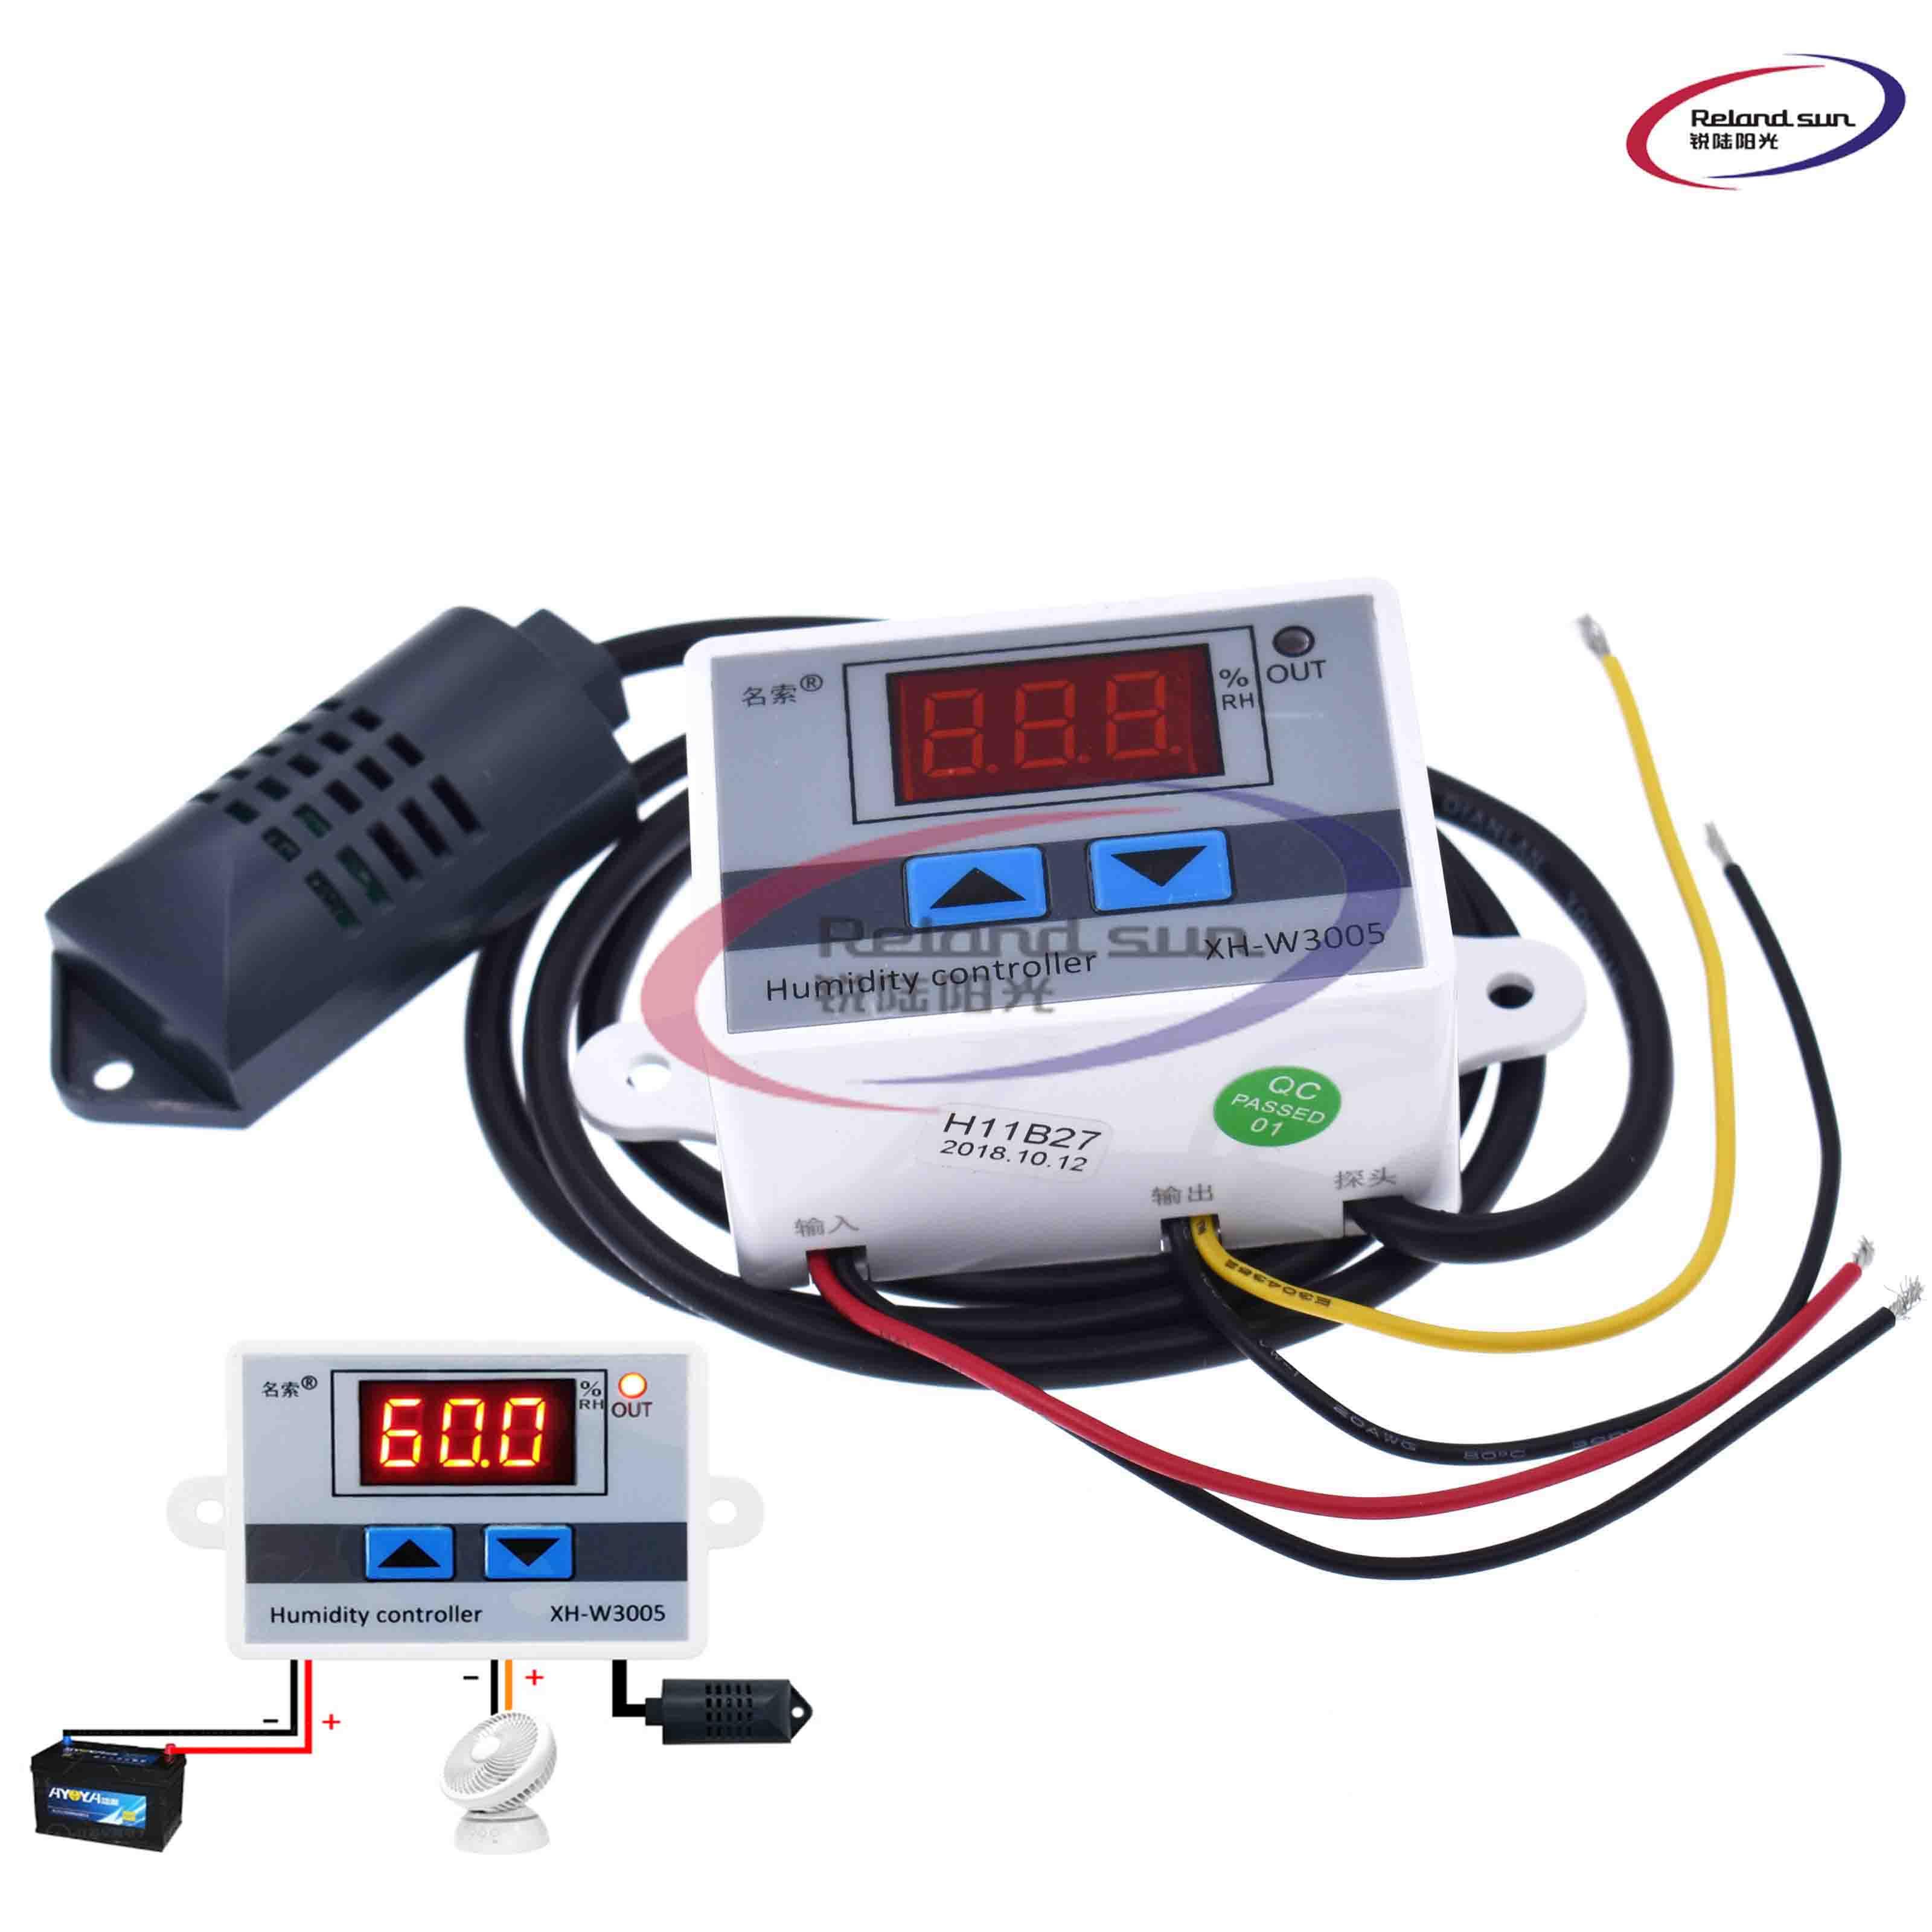 Digital Humidity Controller Humidity Control Switch Hygrometer Sensor 110V-220V